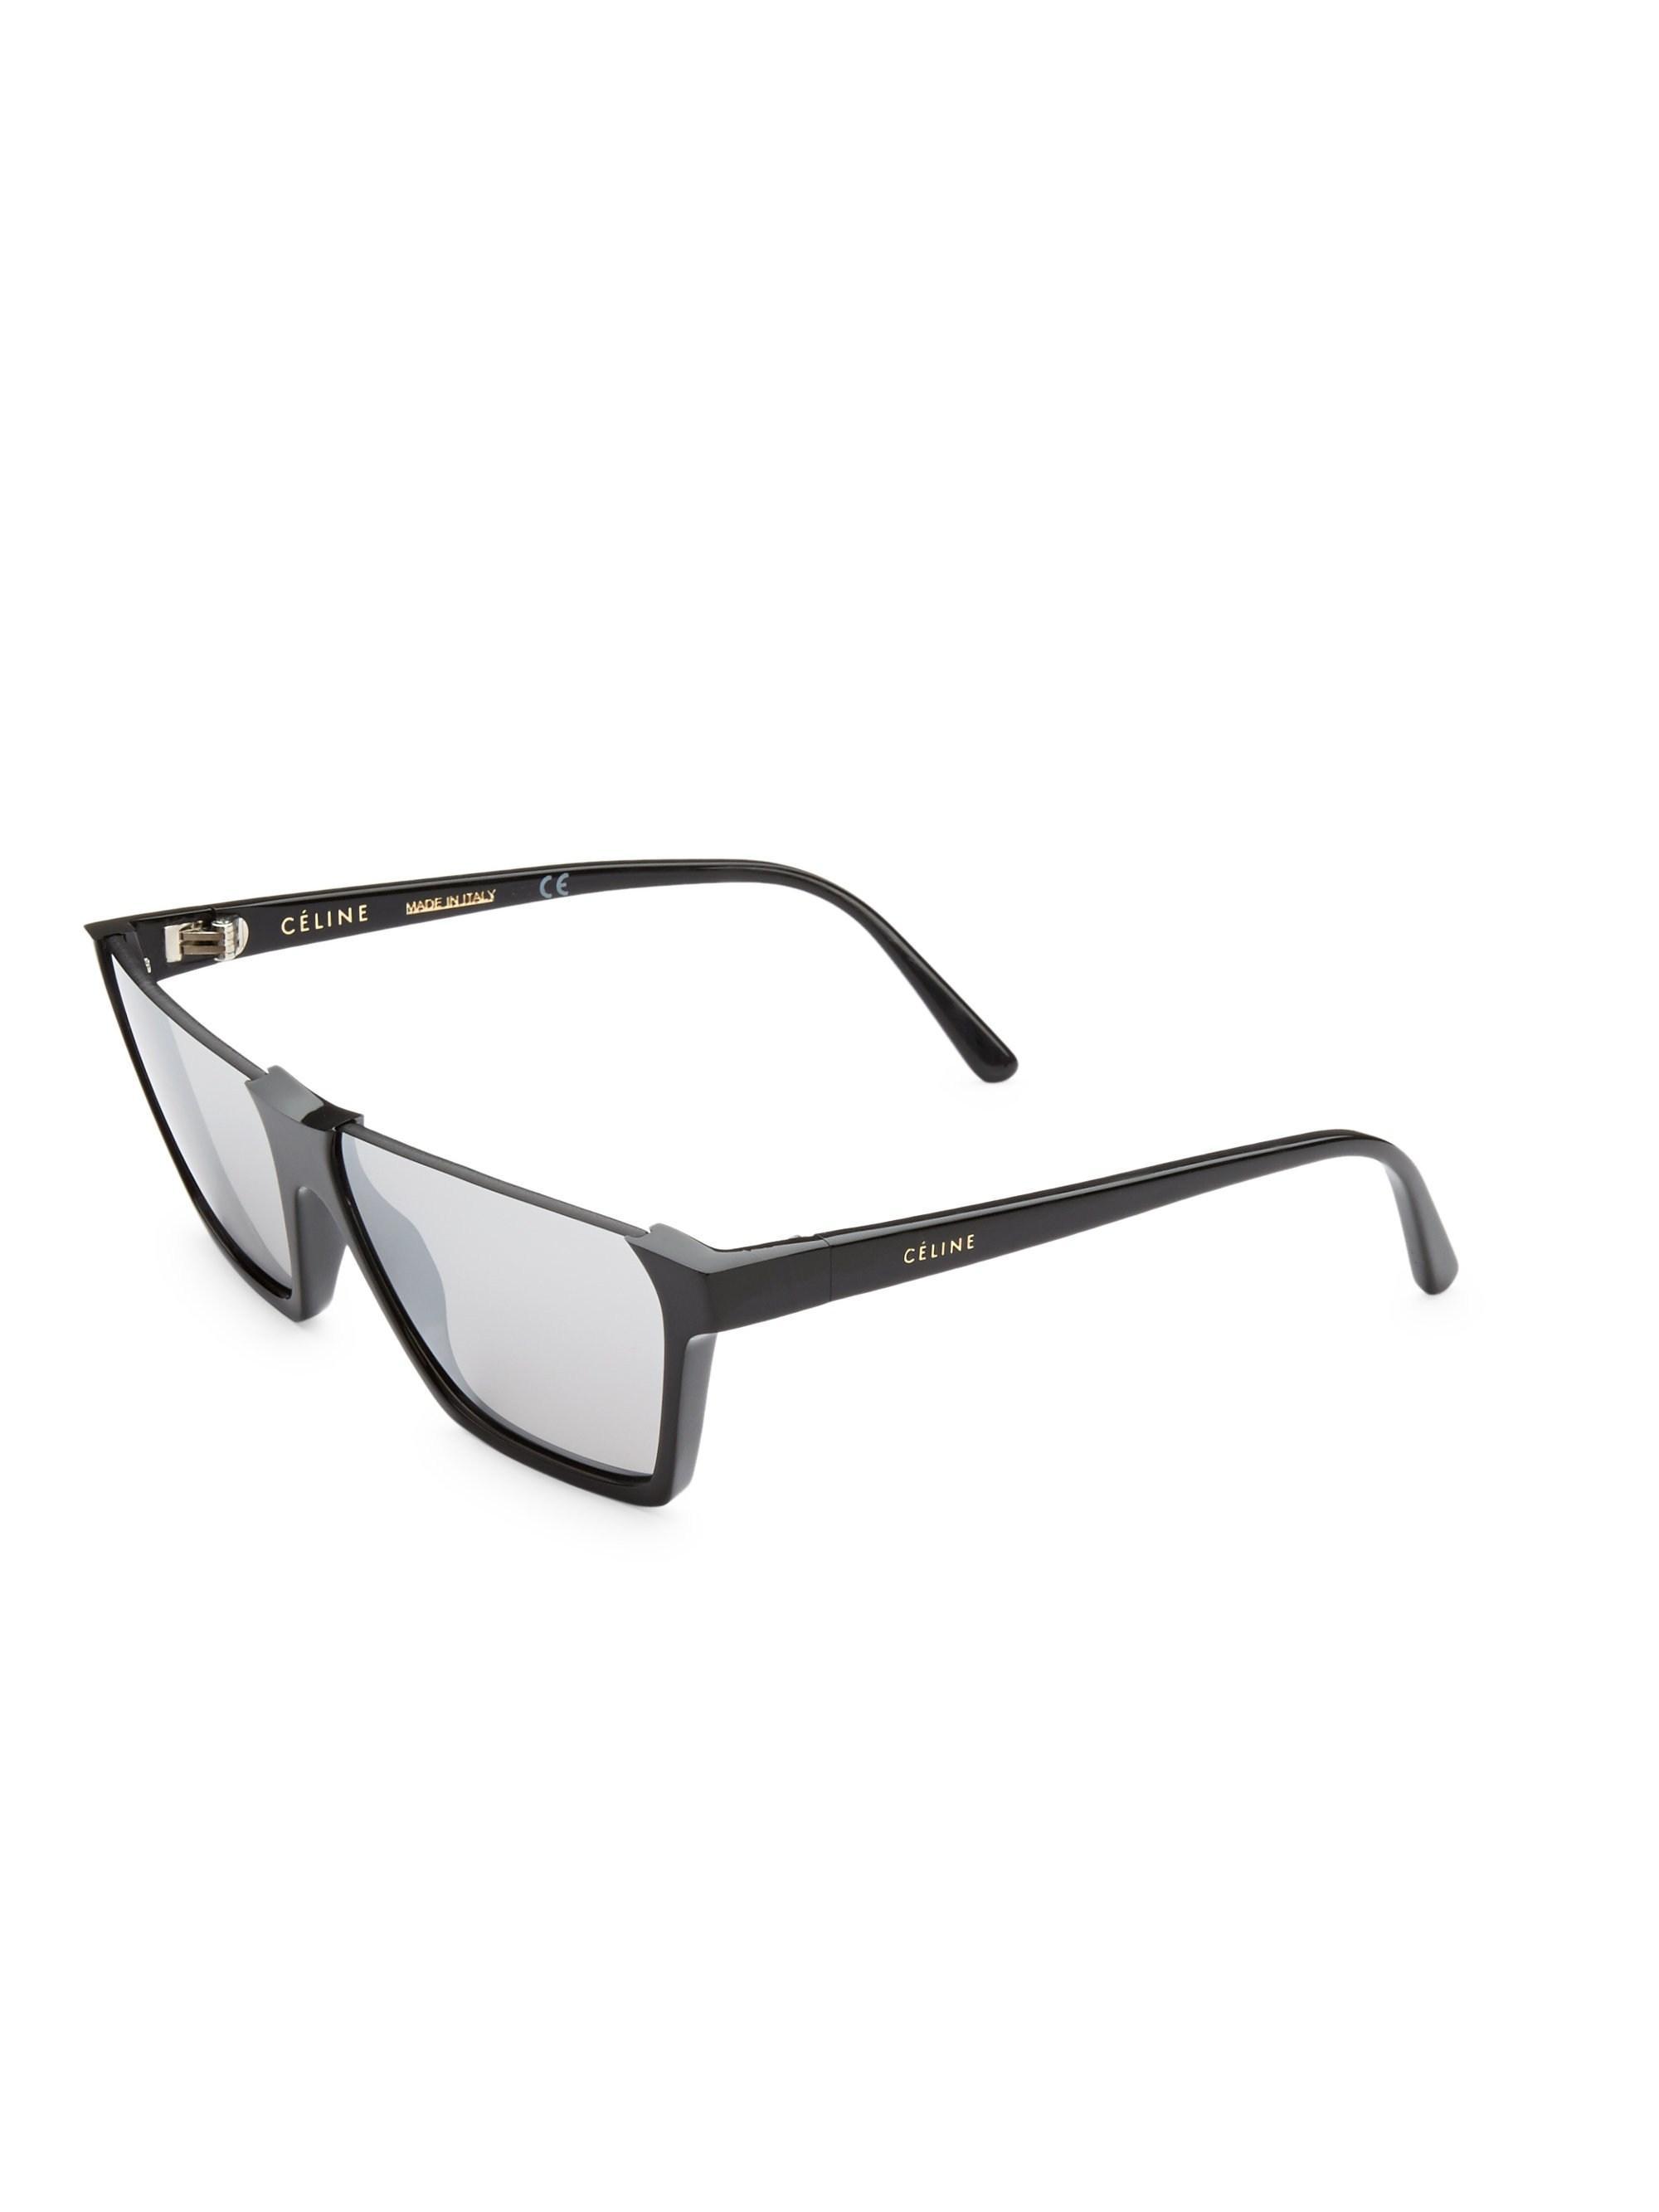 fed275597e Lyst - Céline Women s 60mm Semi-rimless Rectangular Sunglasses ...